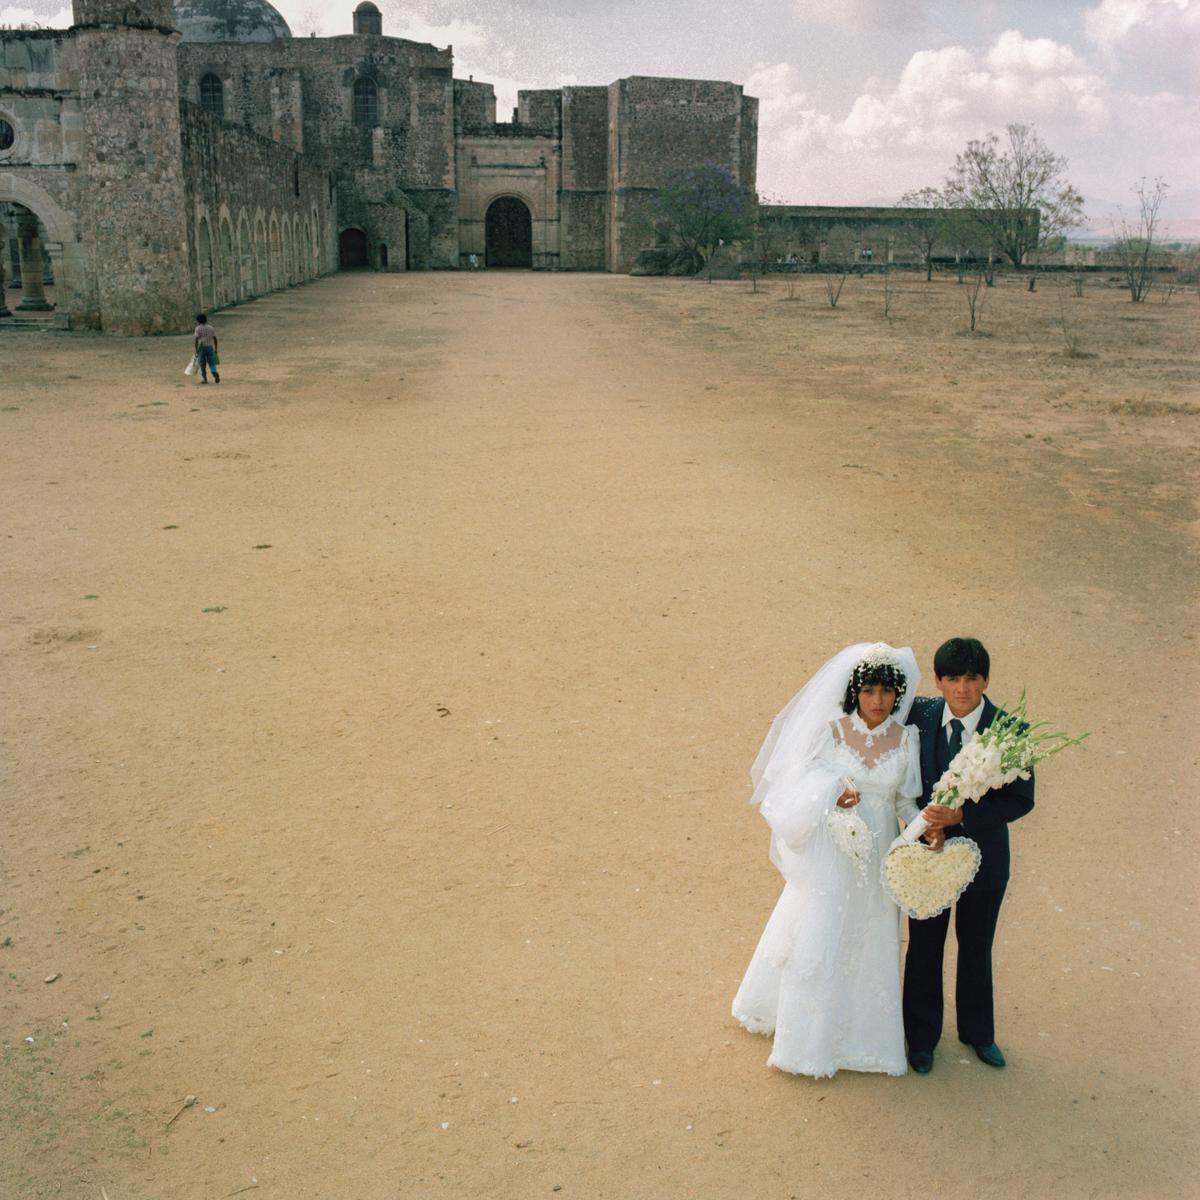 Wedding, Oaxaca, México 1985